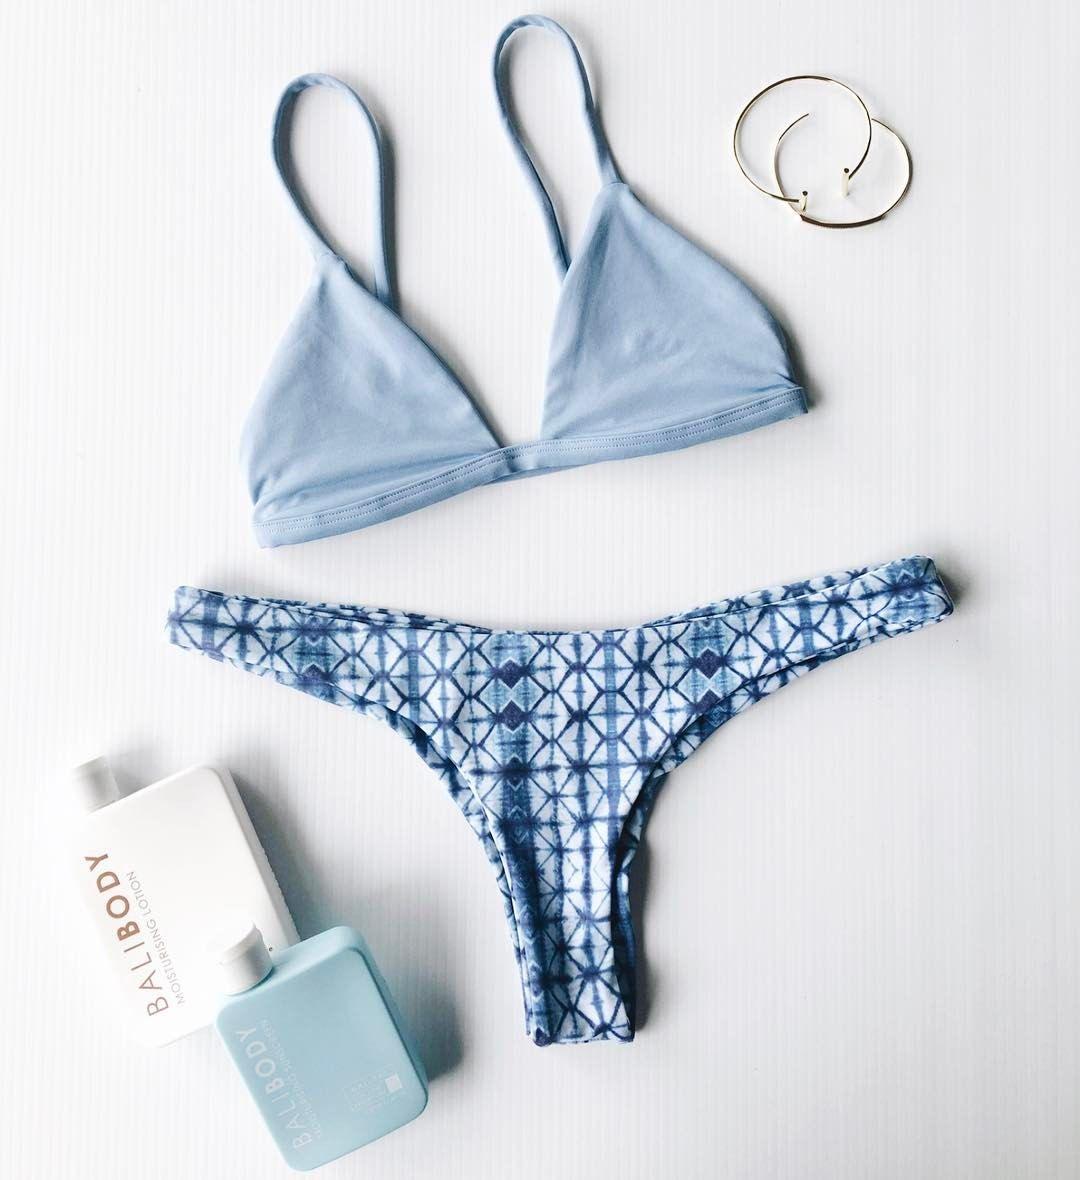 ee5581405980e0 withflowersinyourhairxo:Absolutely love my new Chooks bikini from Boutine LA !